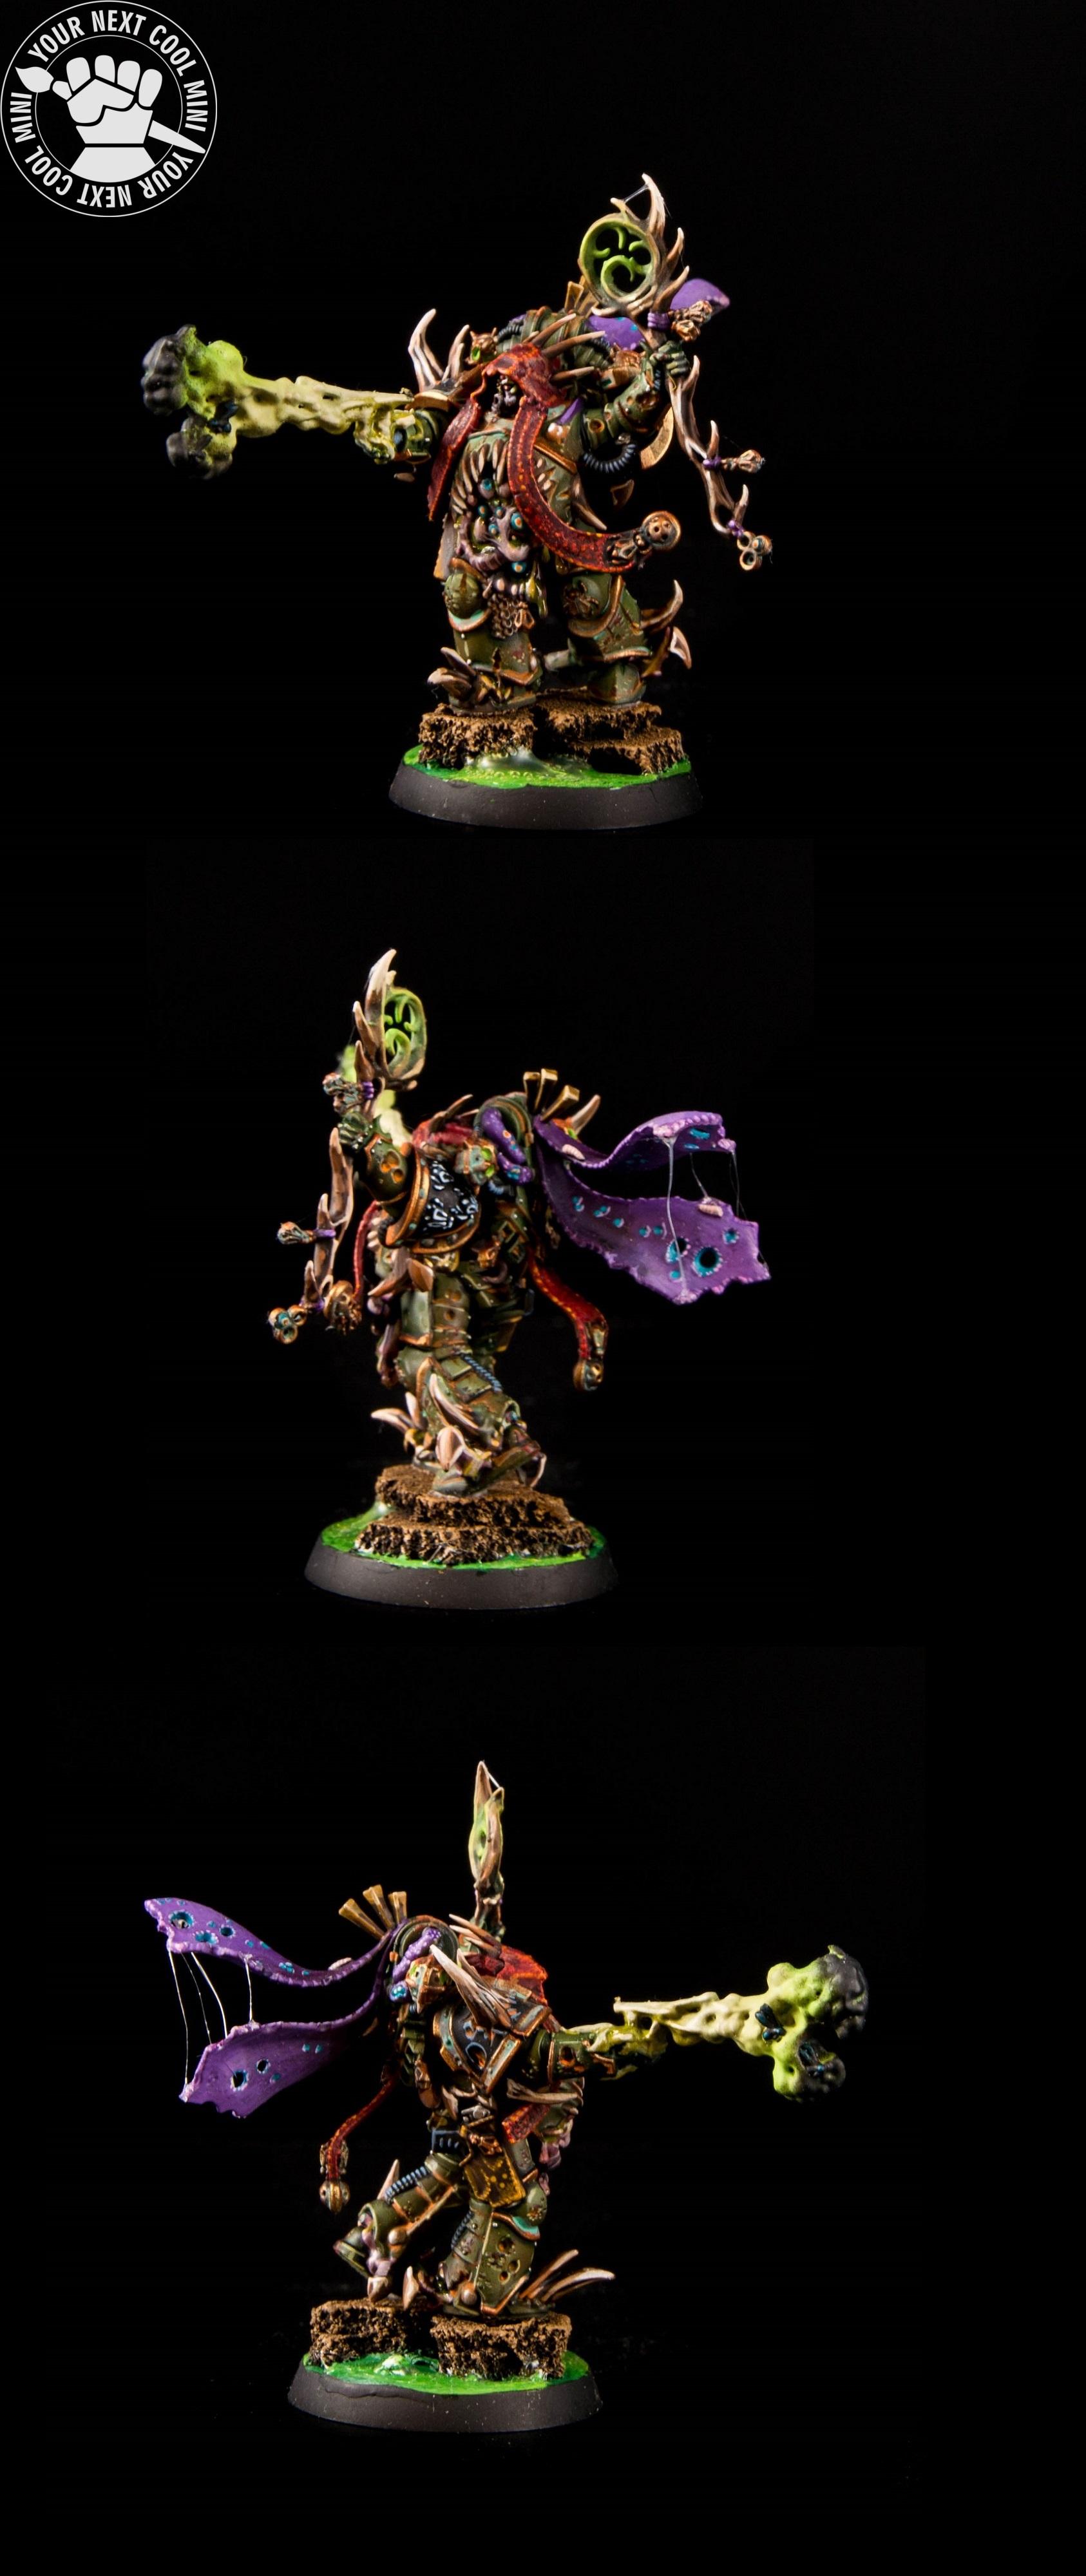 Warhammer 40K, Death Guard Malignant Plaguecaster